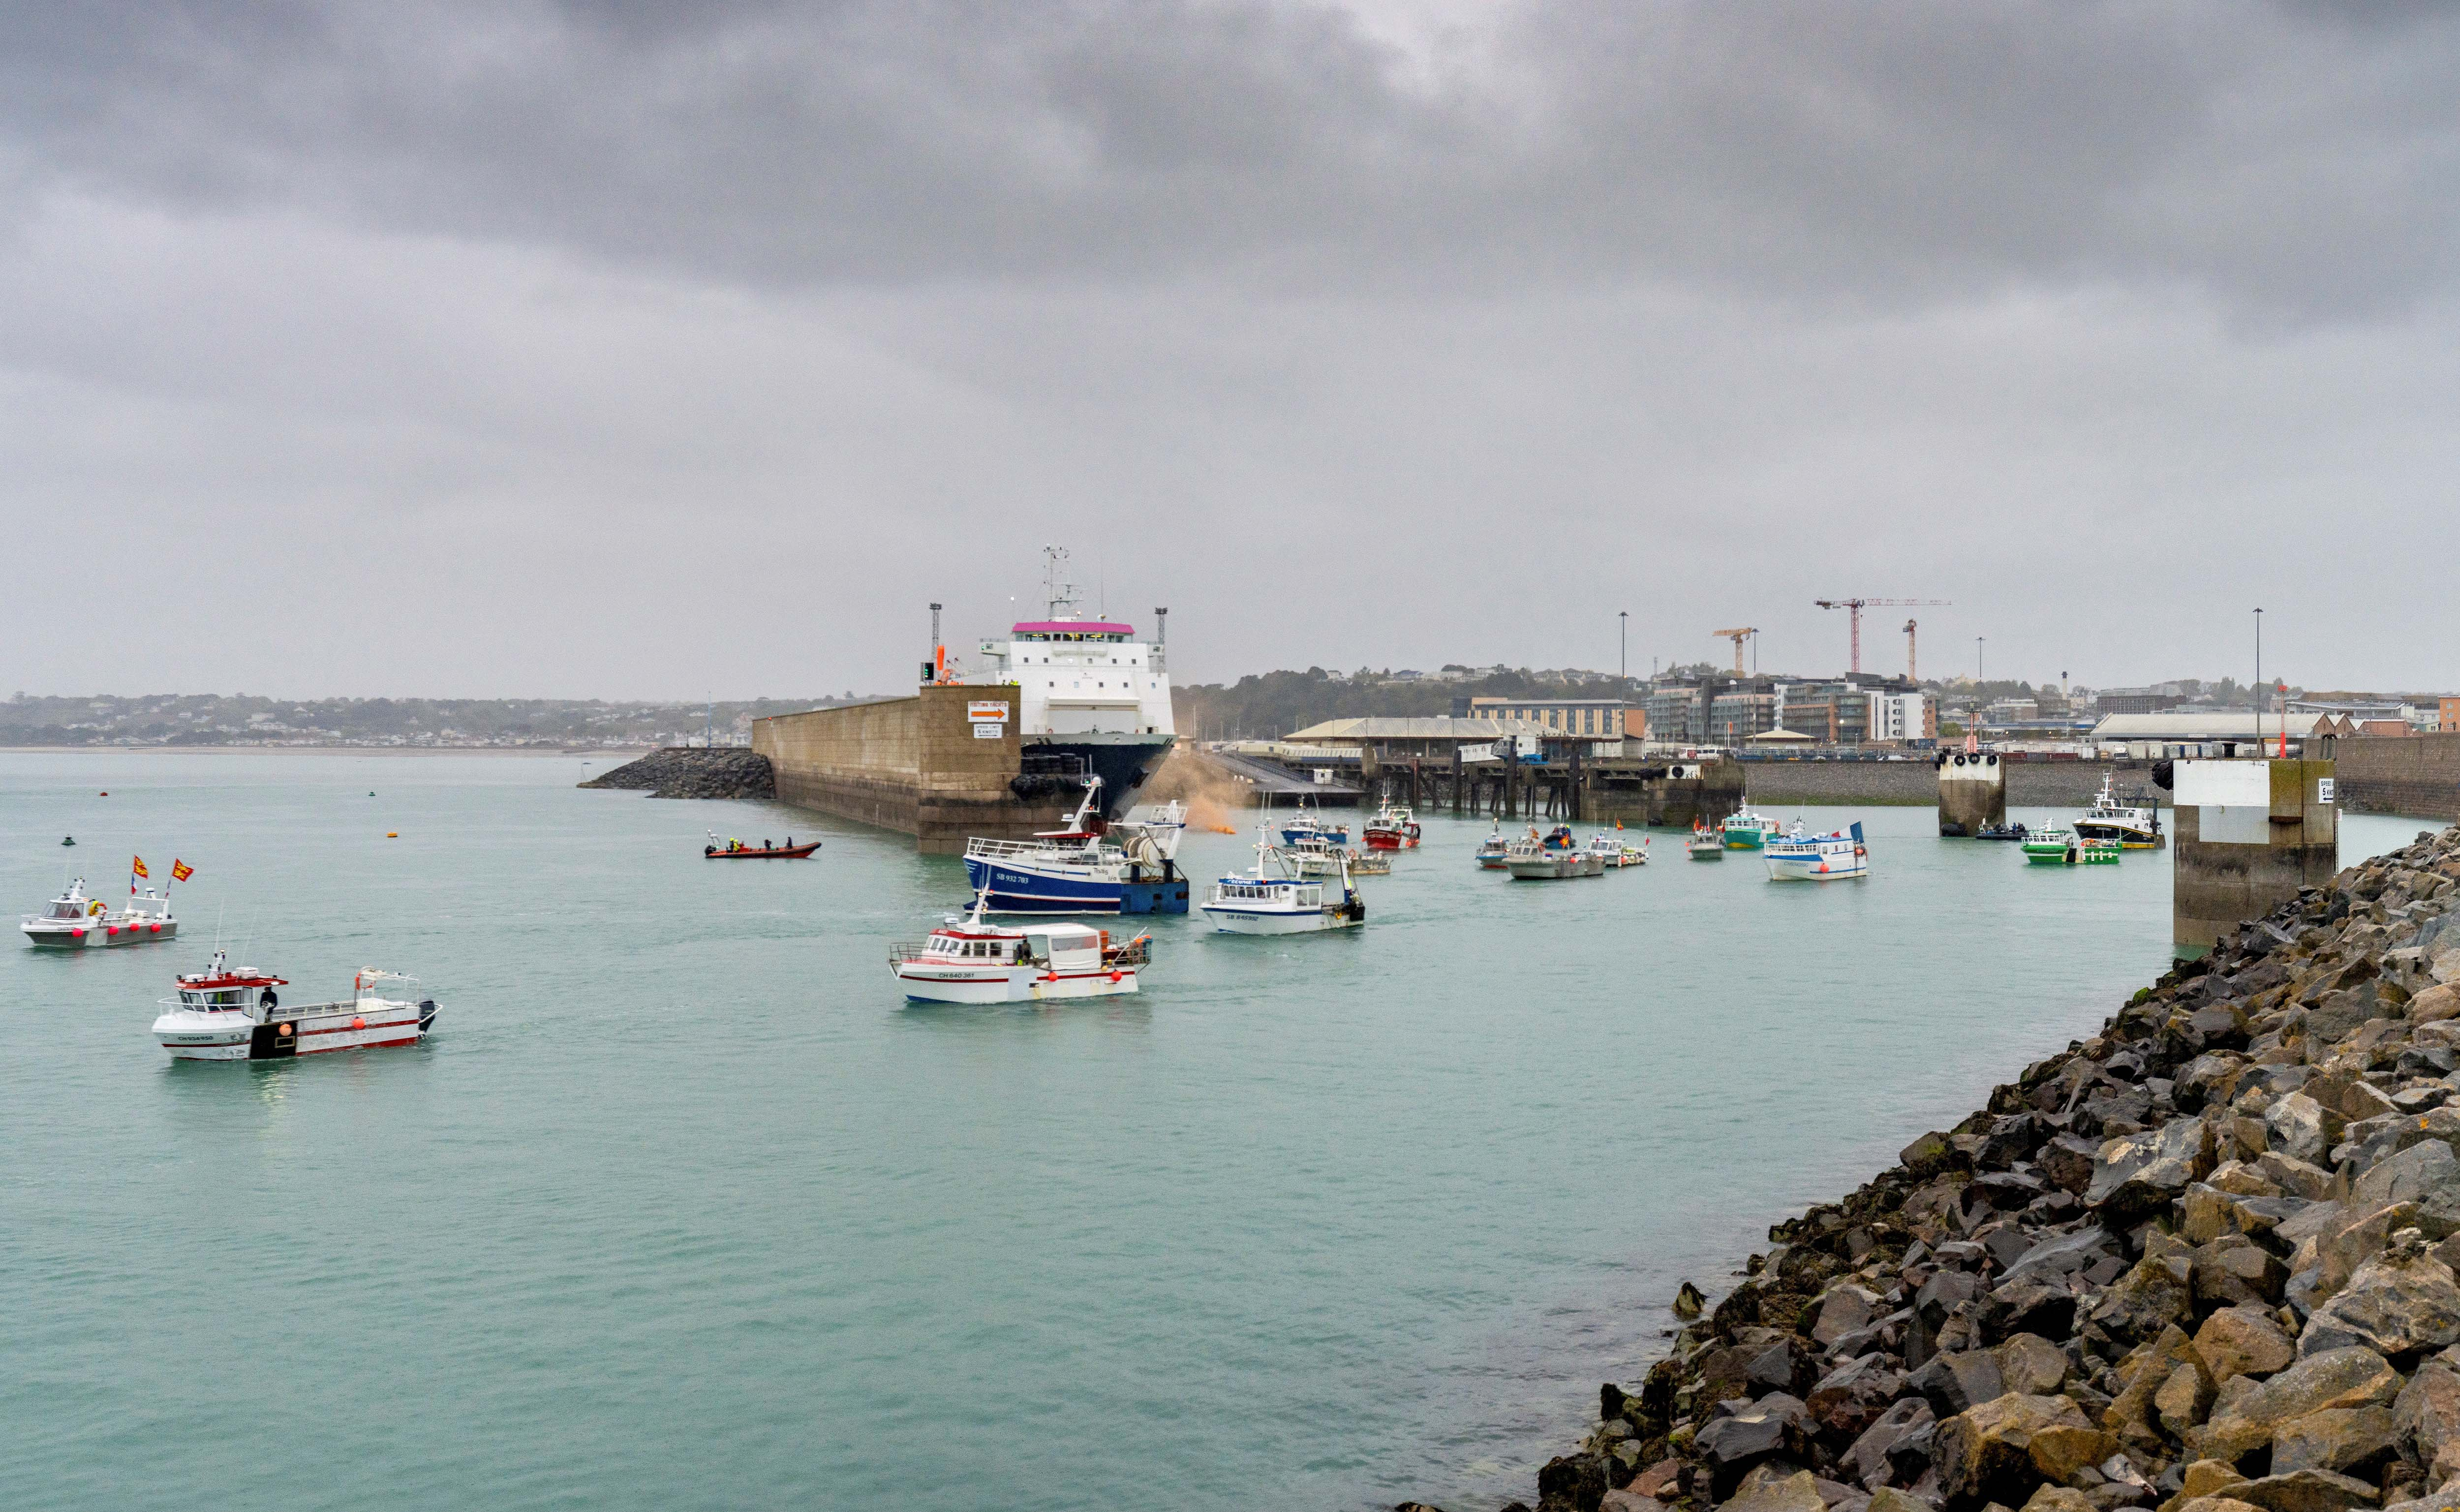 Frota de navios de pesca franceses